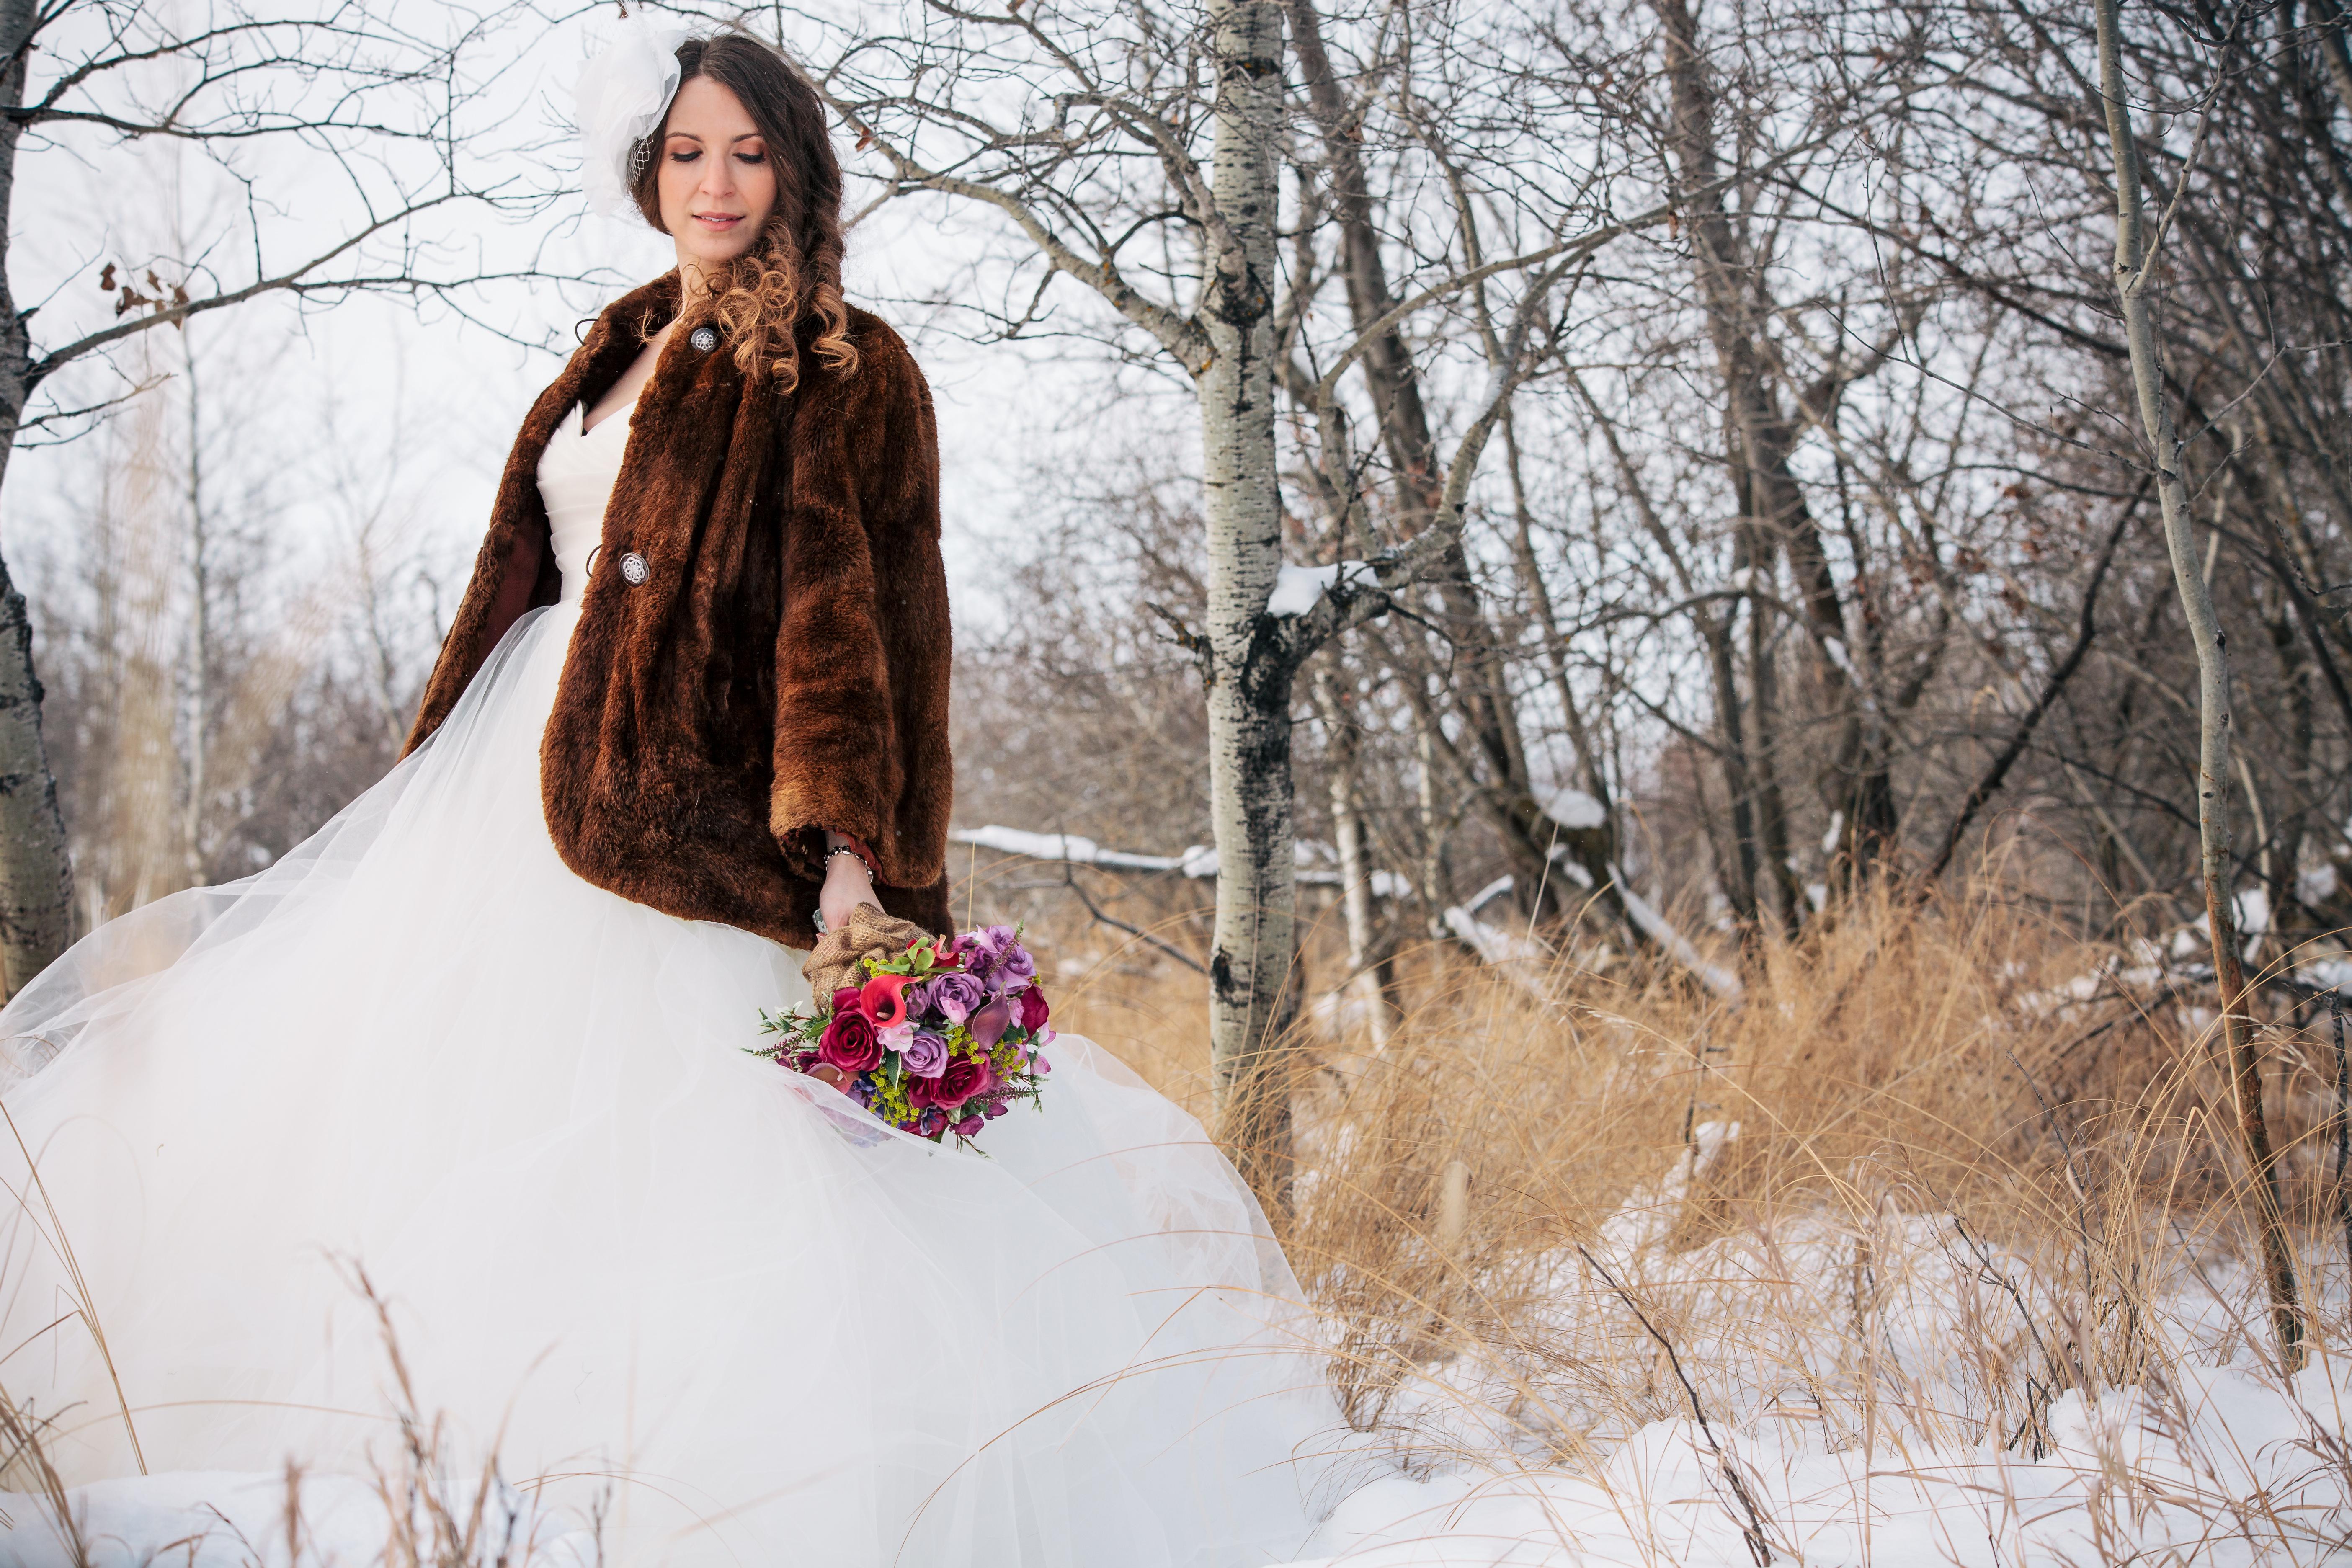 Fur Coats for your Winter Weddings | Amanda Douglas Events